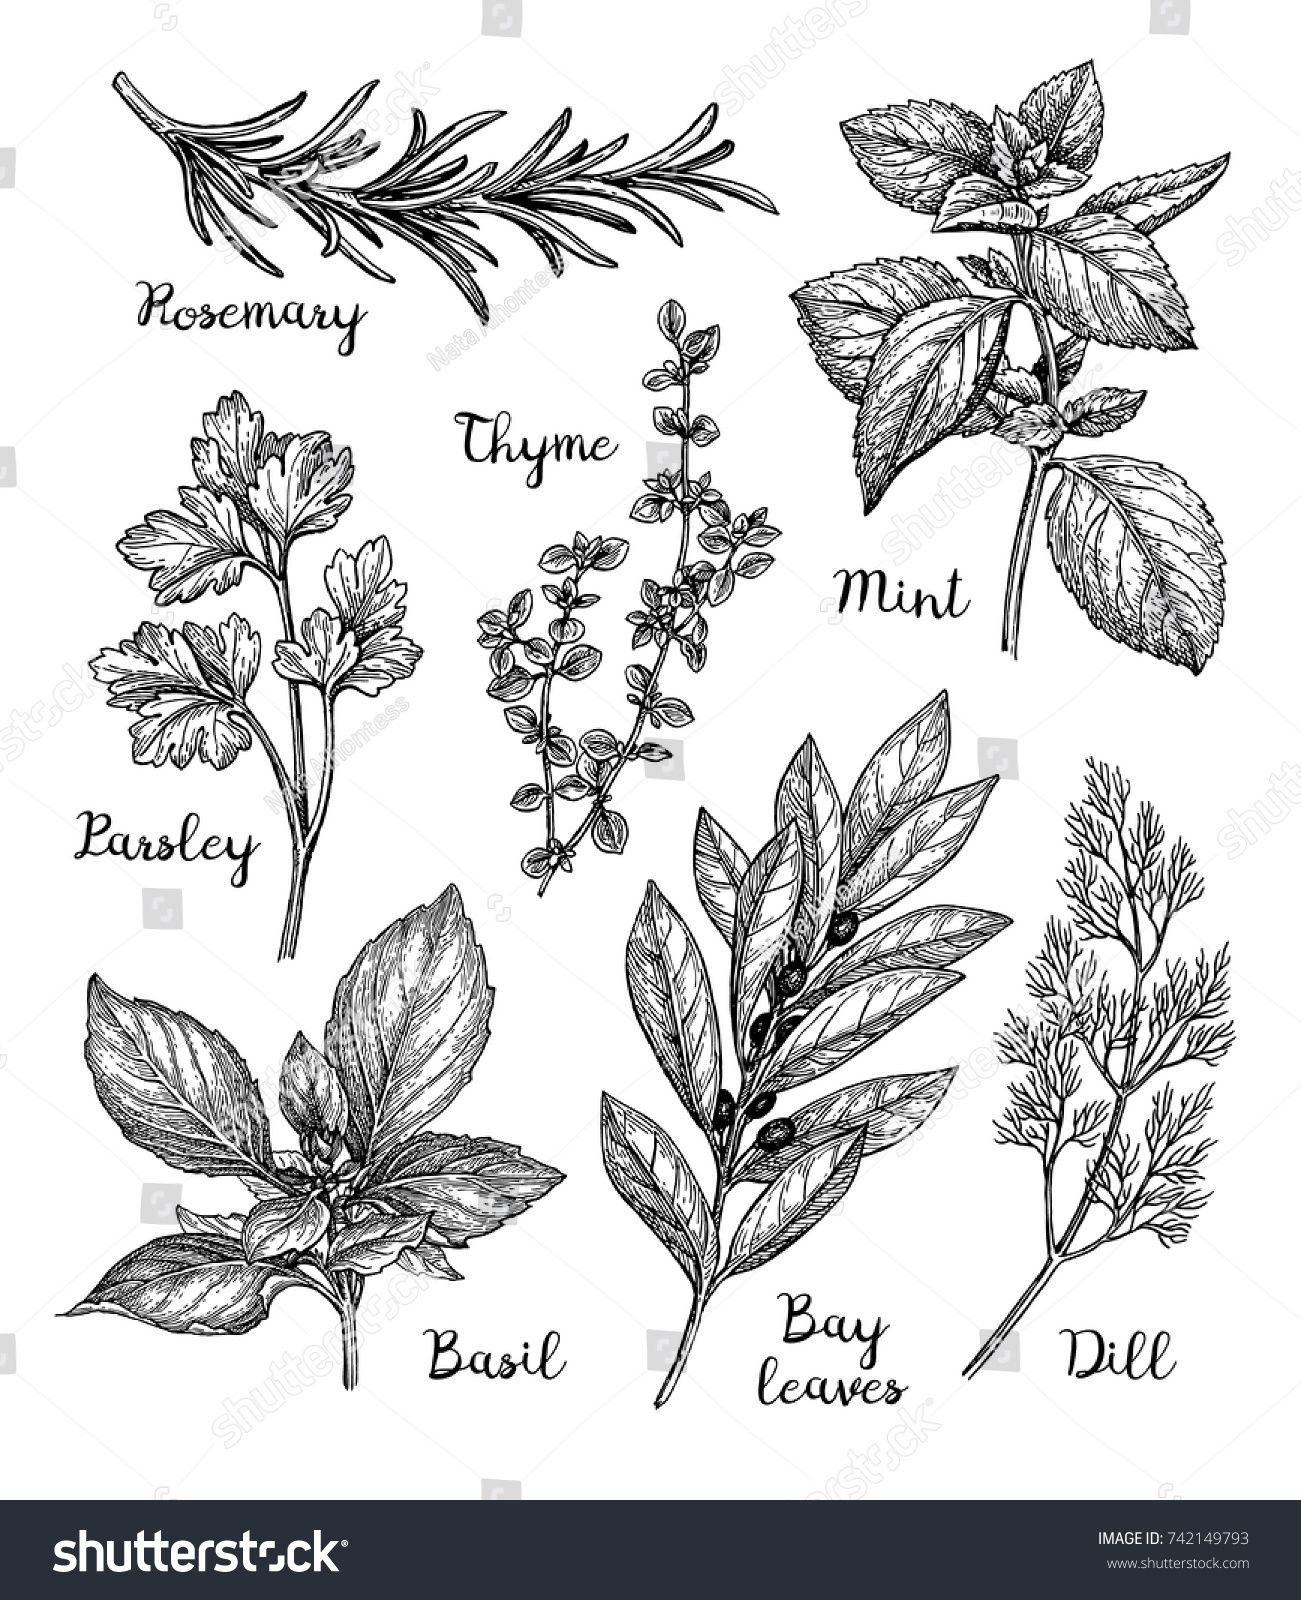 png free download Herbs set